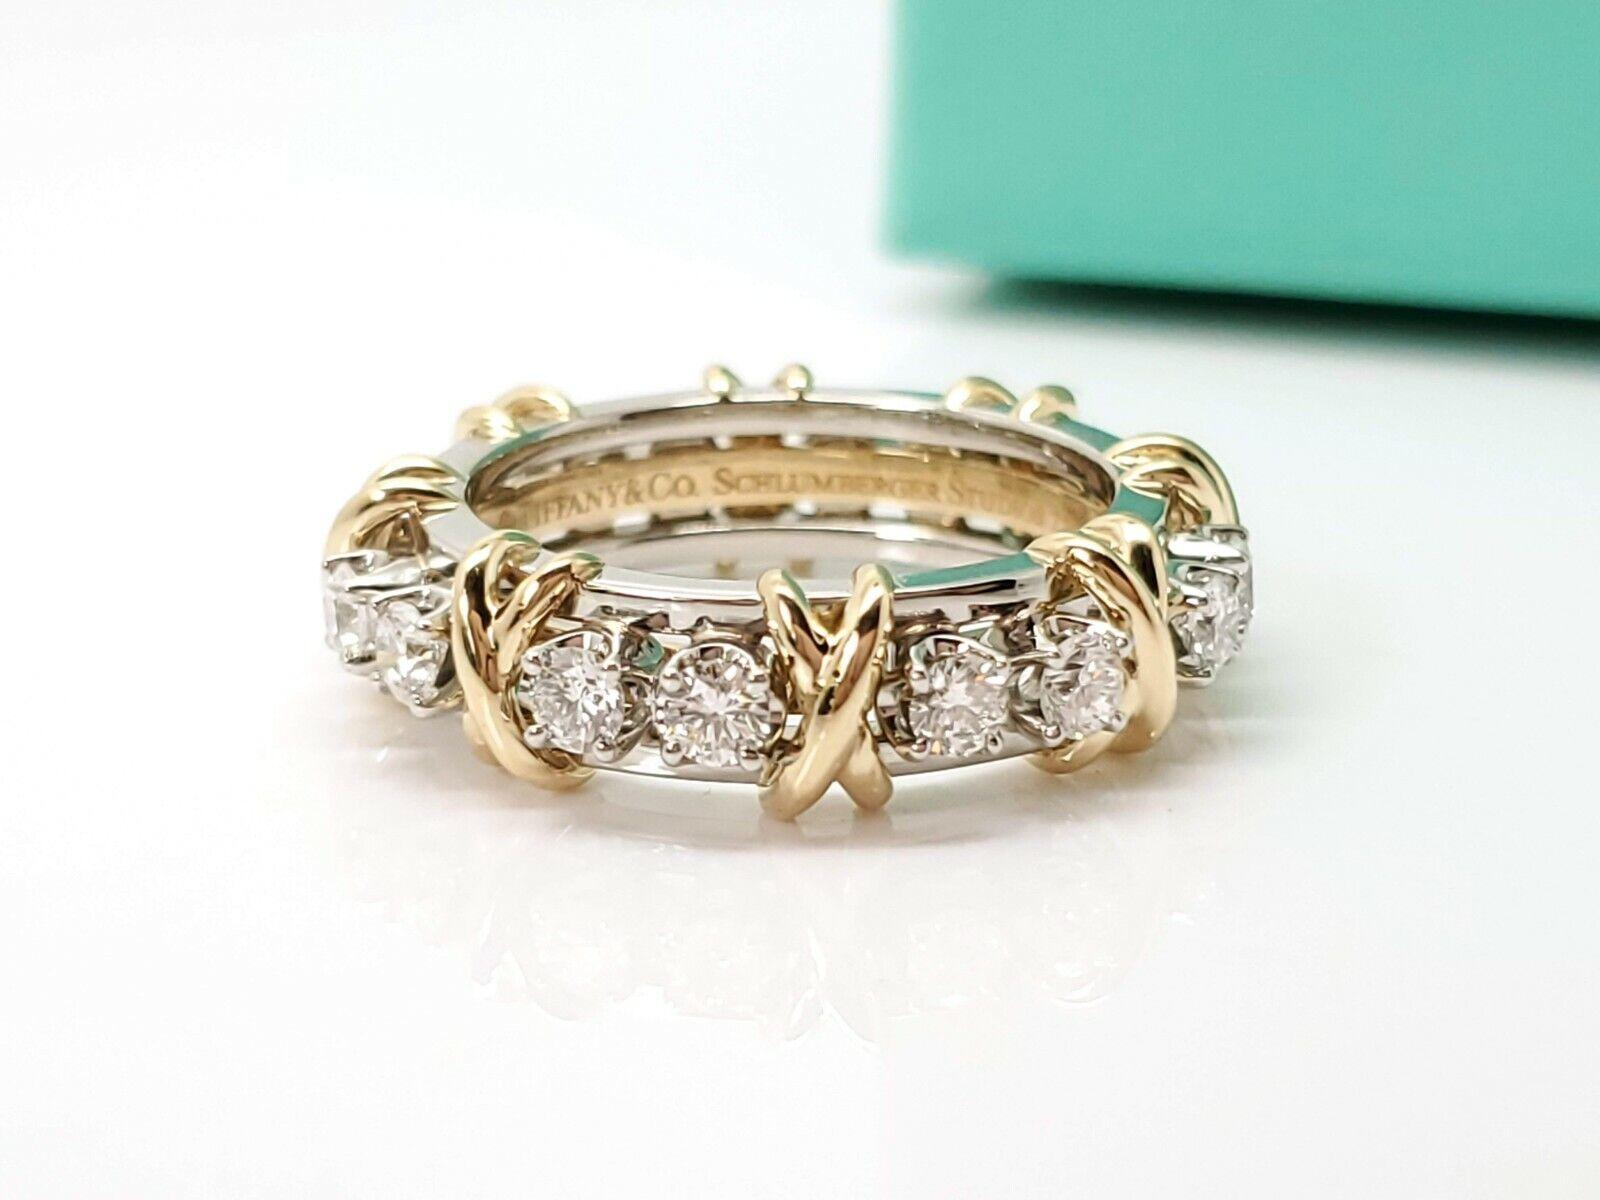 TIFFANY & Co 18k Gold Platinum Schlumberger Sixteen Stone Diamond X Ring 7.75